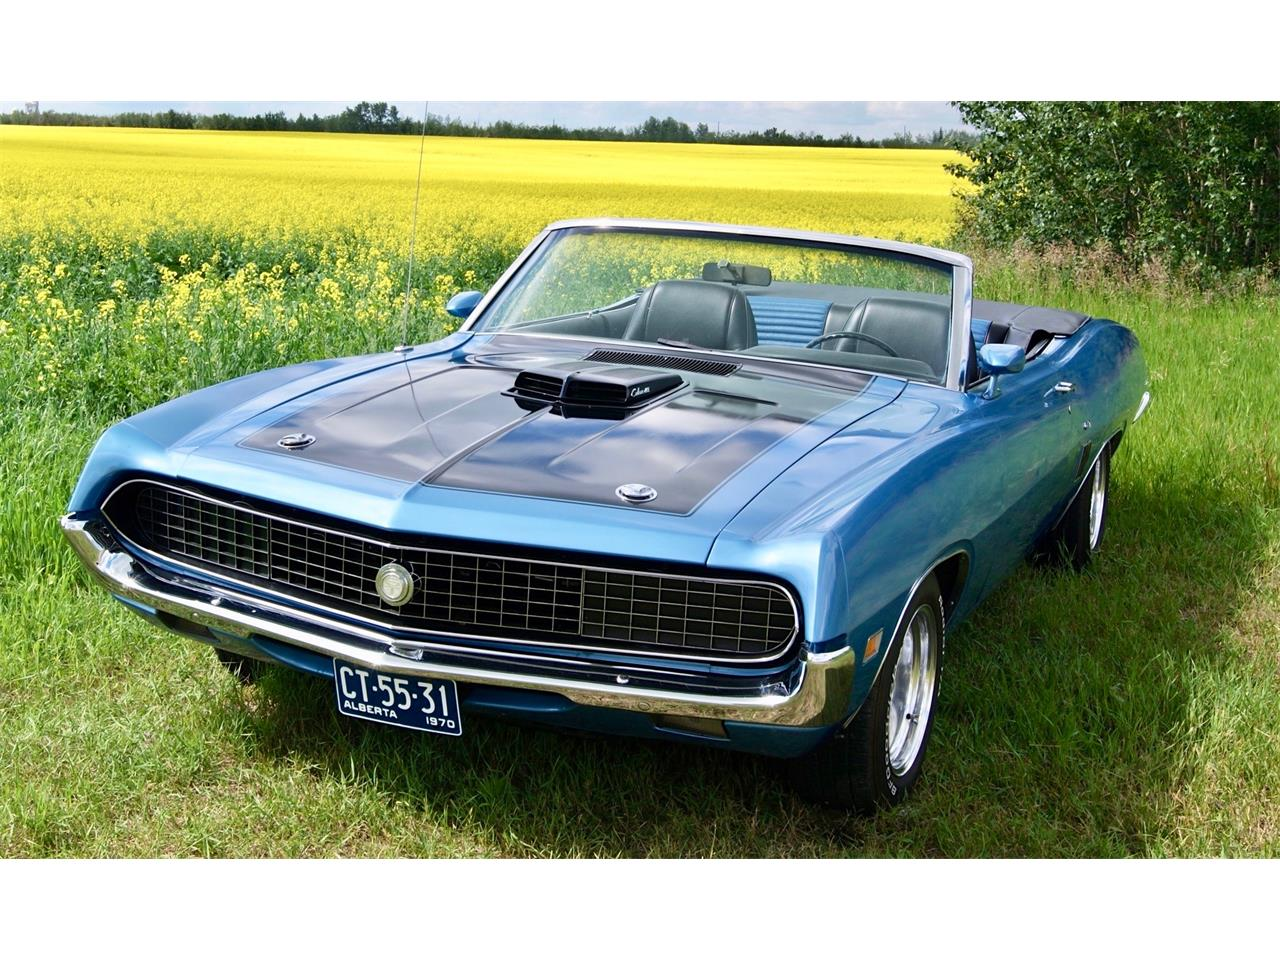 1970 Ford Torino for Sale ClassicCarscom CC1101958